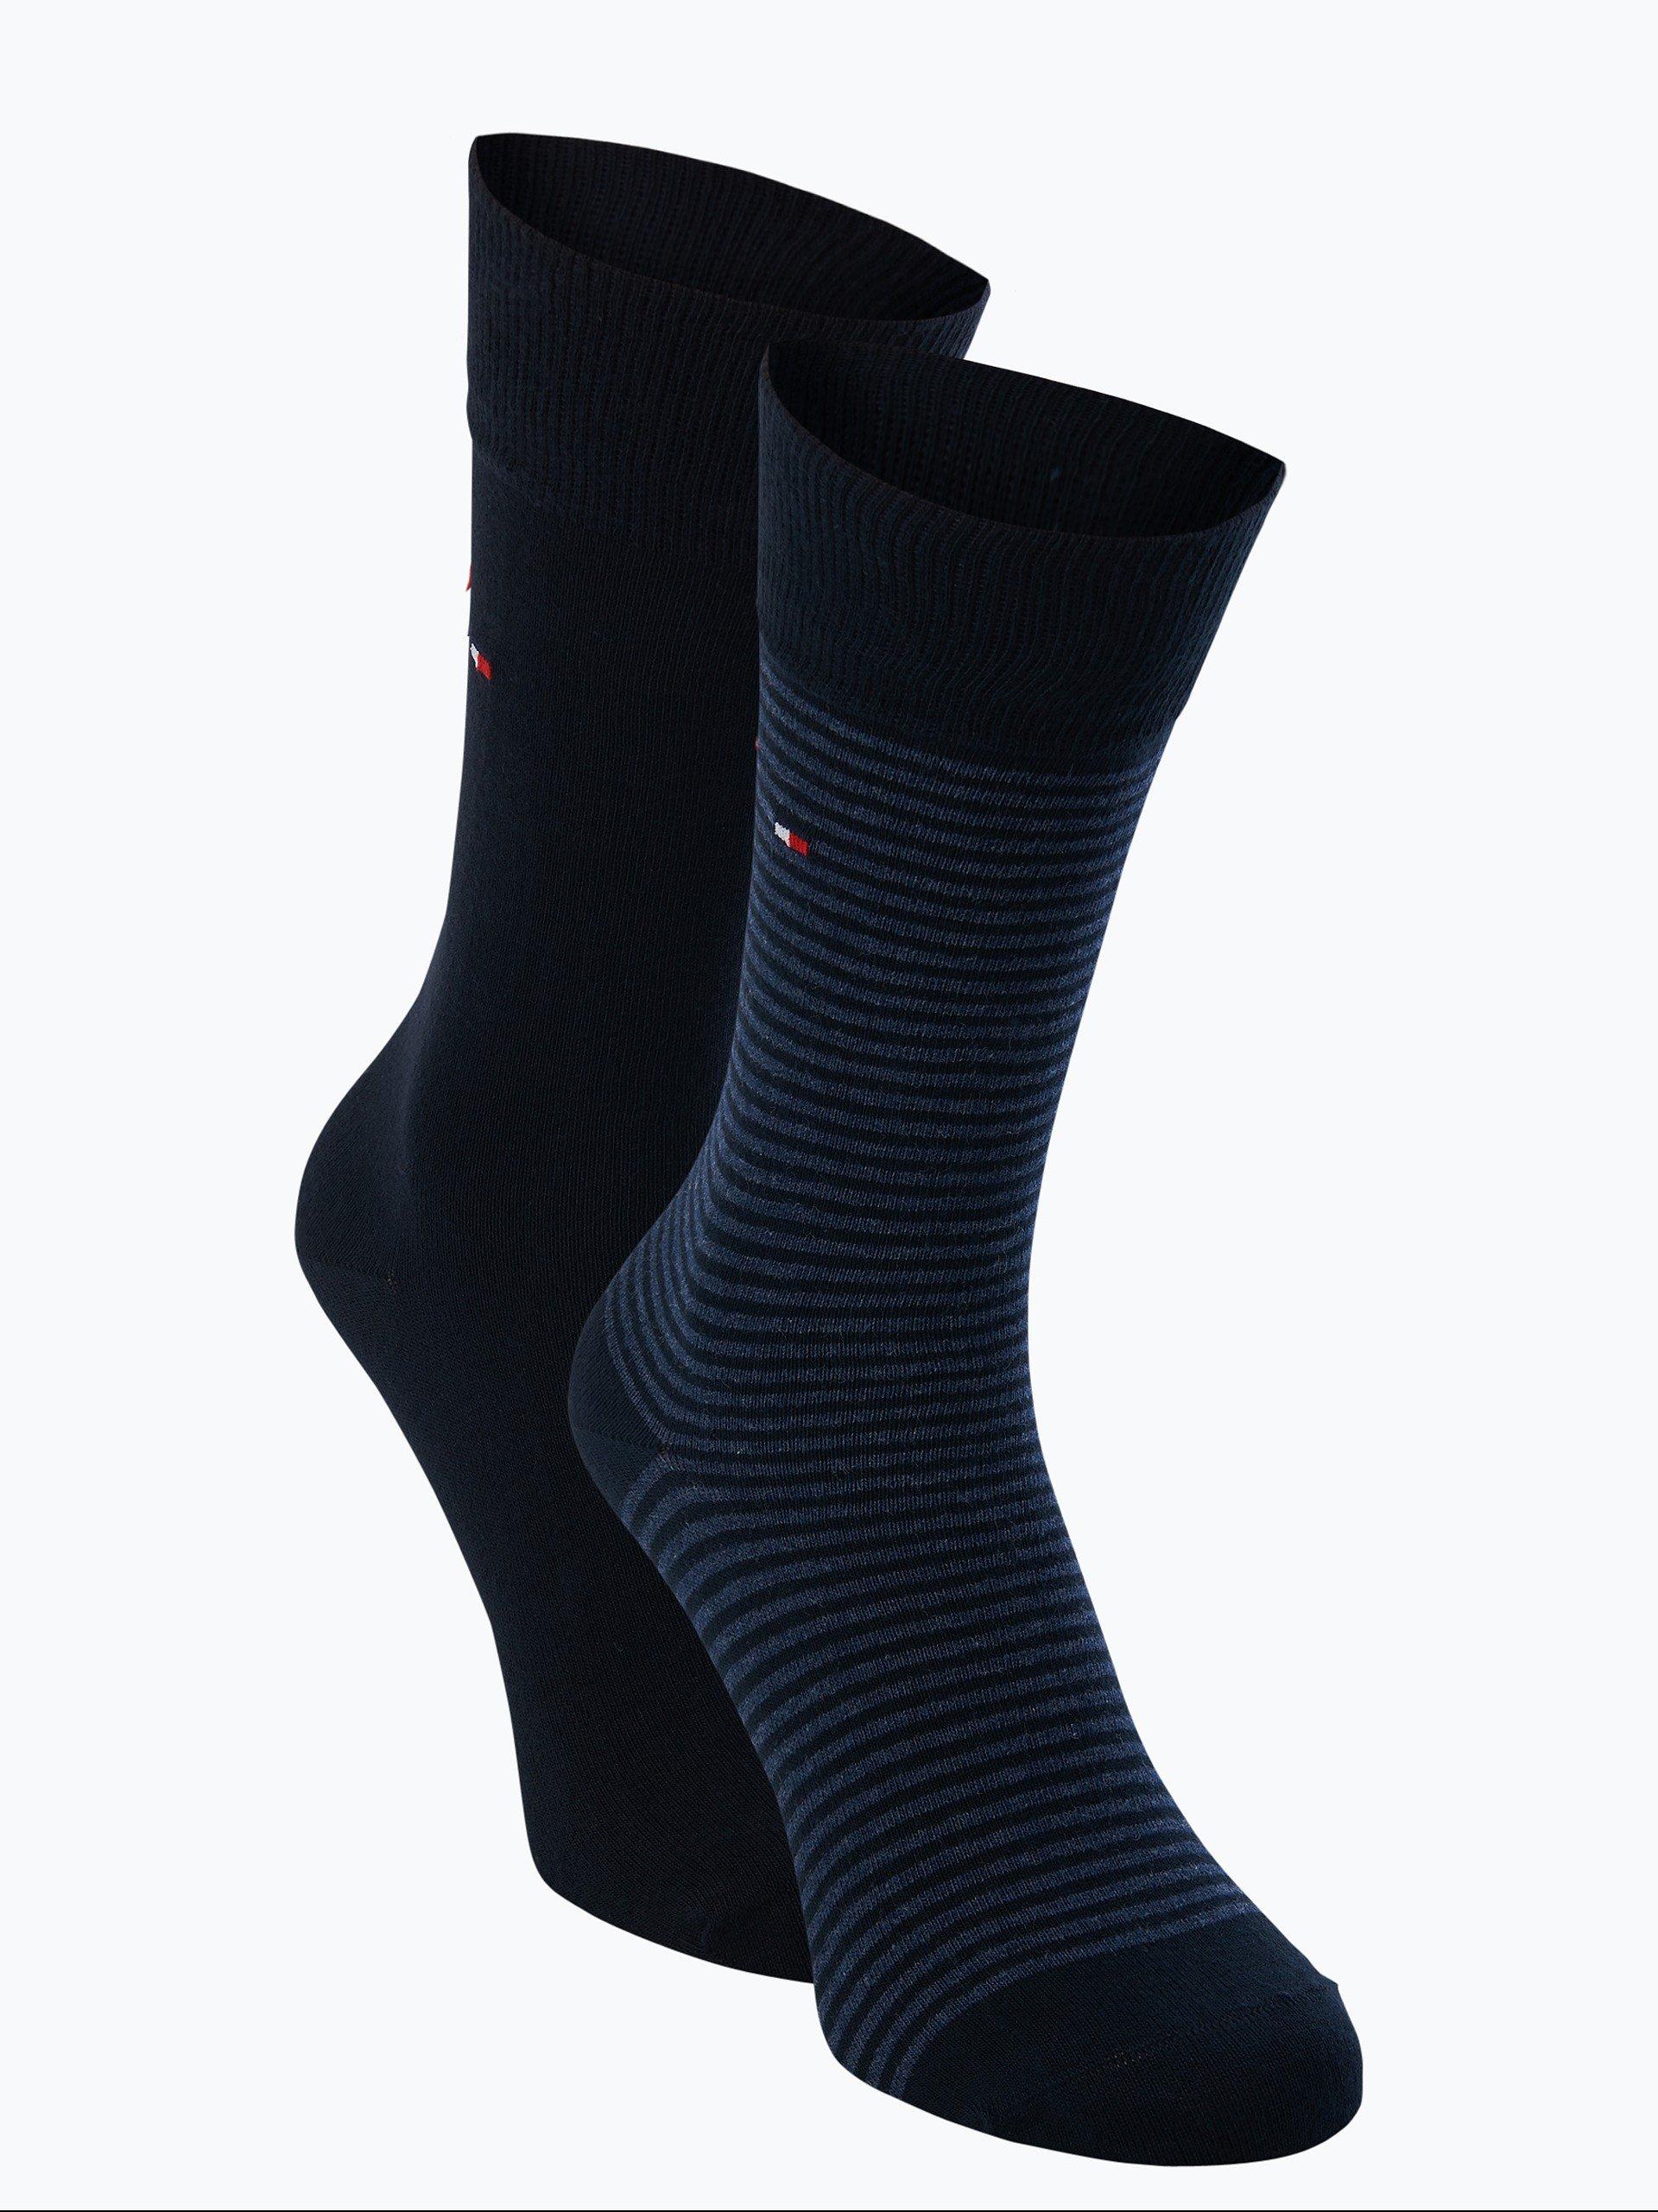 Tommy Hilfiger Herren Socken im 2er-Pack